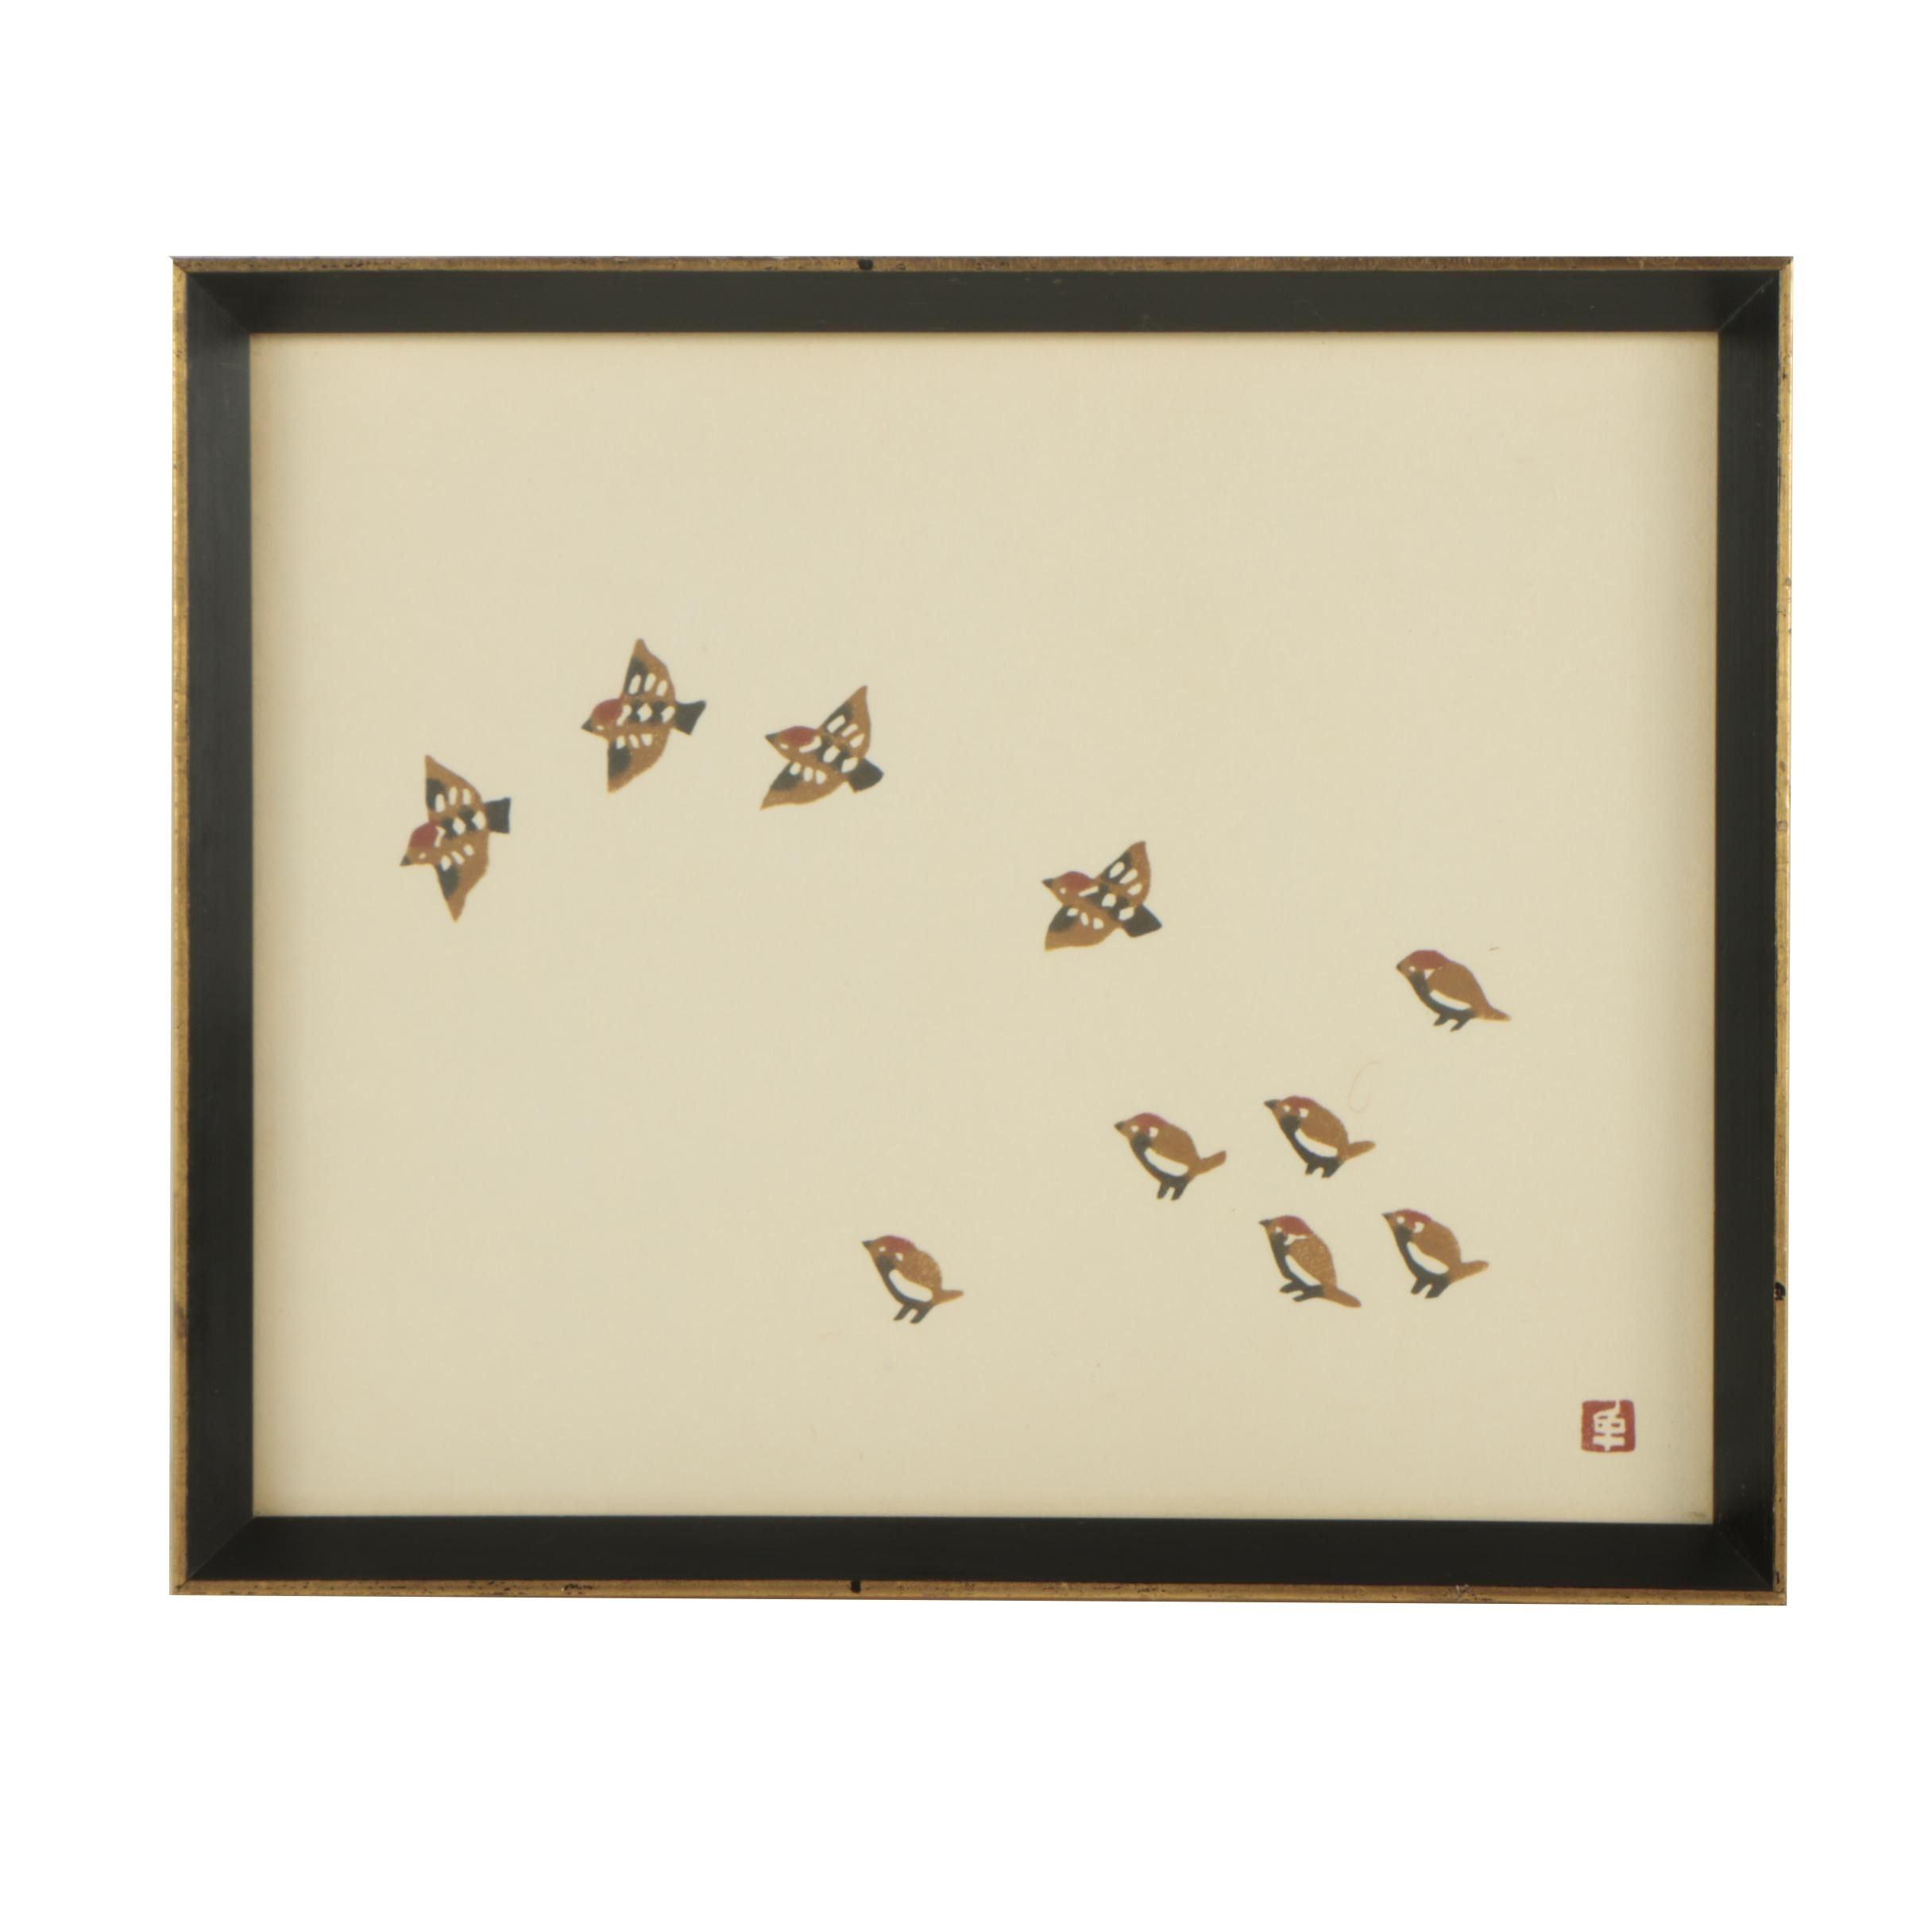 Mikumo Ishihara Japanese Woodblock